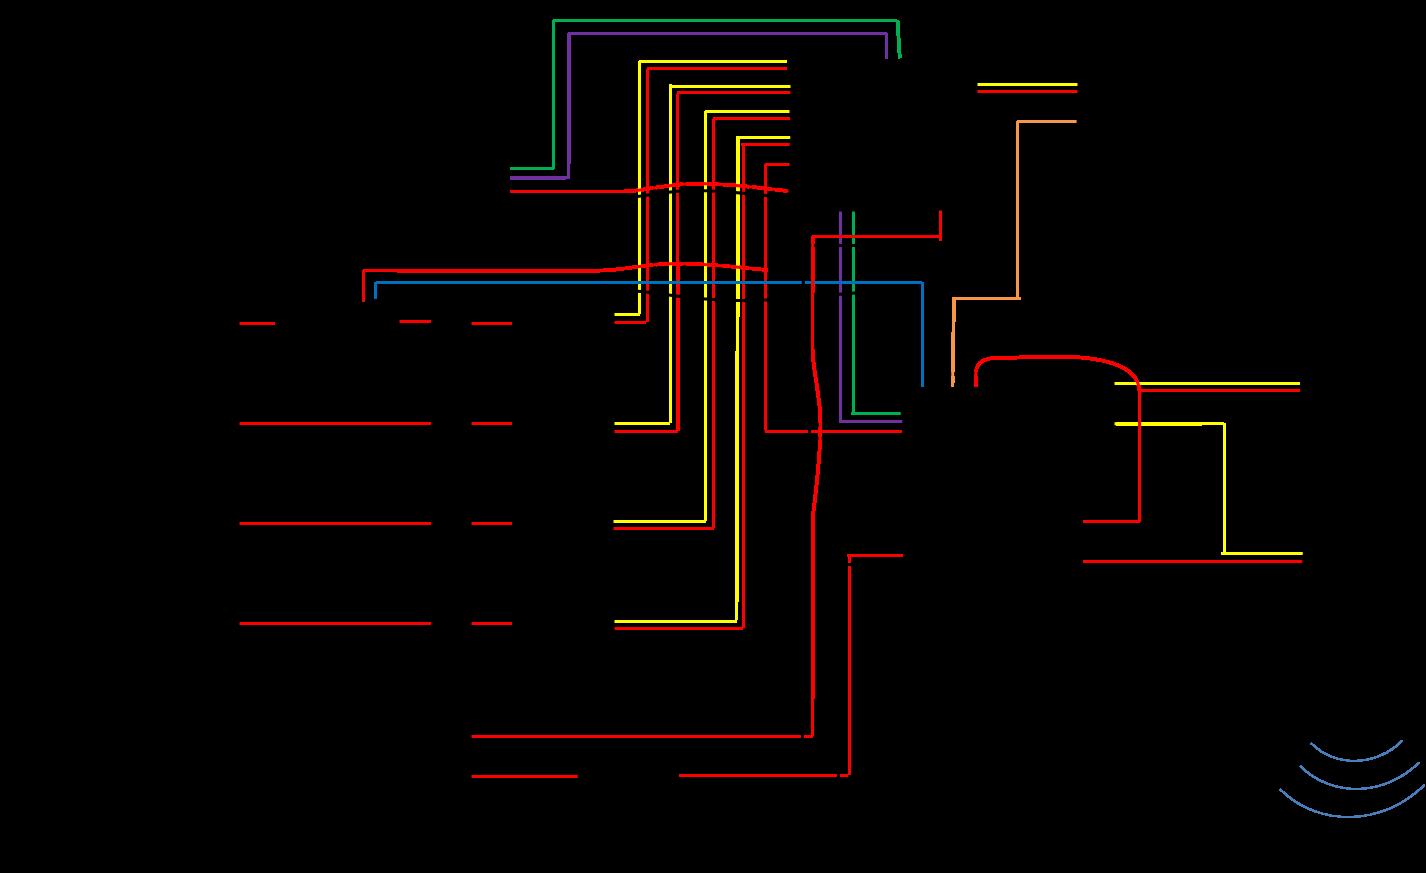 YV_0731] Naza V2 Wiring Diagram Naza Lite Wiring Diagram Free Download Wiring  Schematic WiringUsly Majo Tool Mohammedshrine Librar Wiring 101